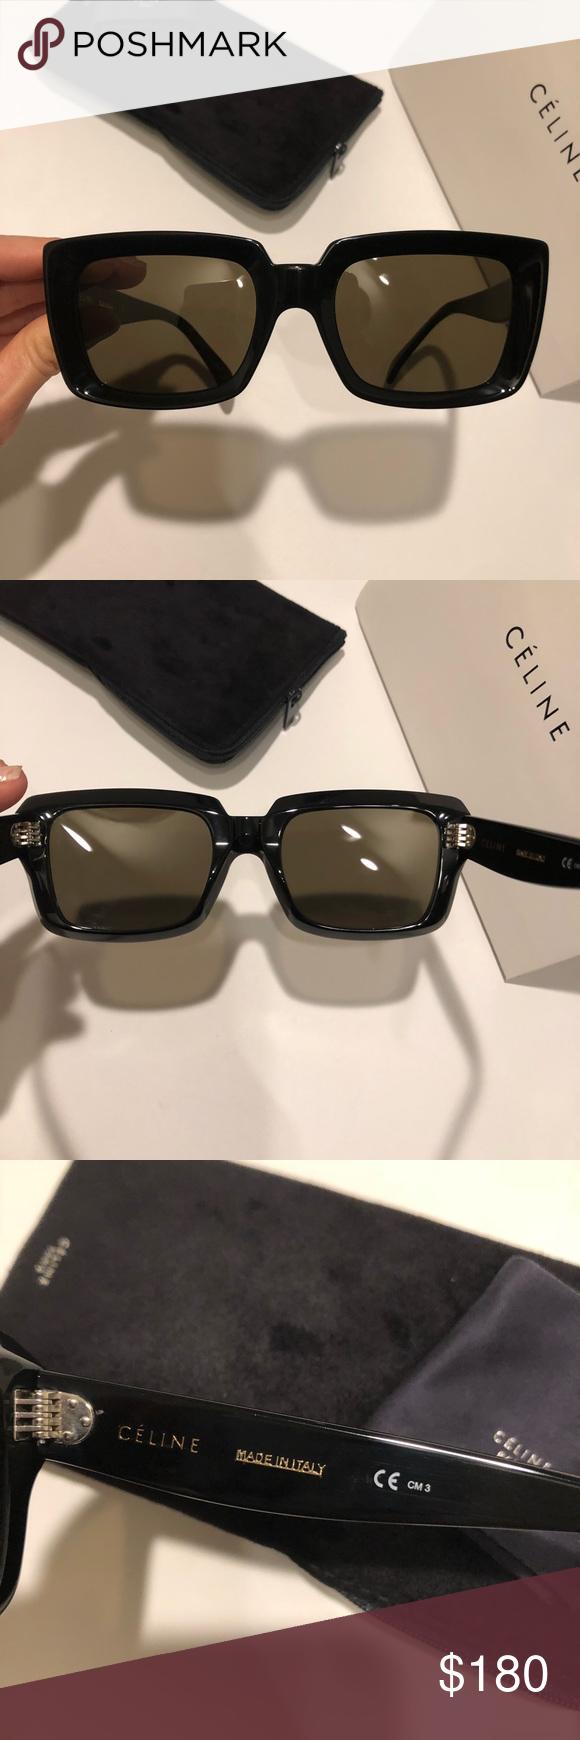 1c7e5150609 Spotted while shopping on Poshmark  Celine sunglasses!  poshmark  fashion   shopping  style  Celine  Accessories